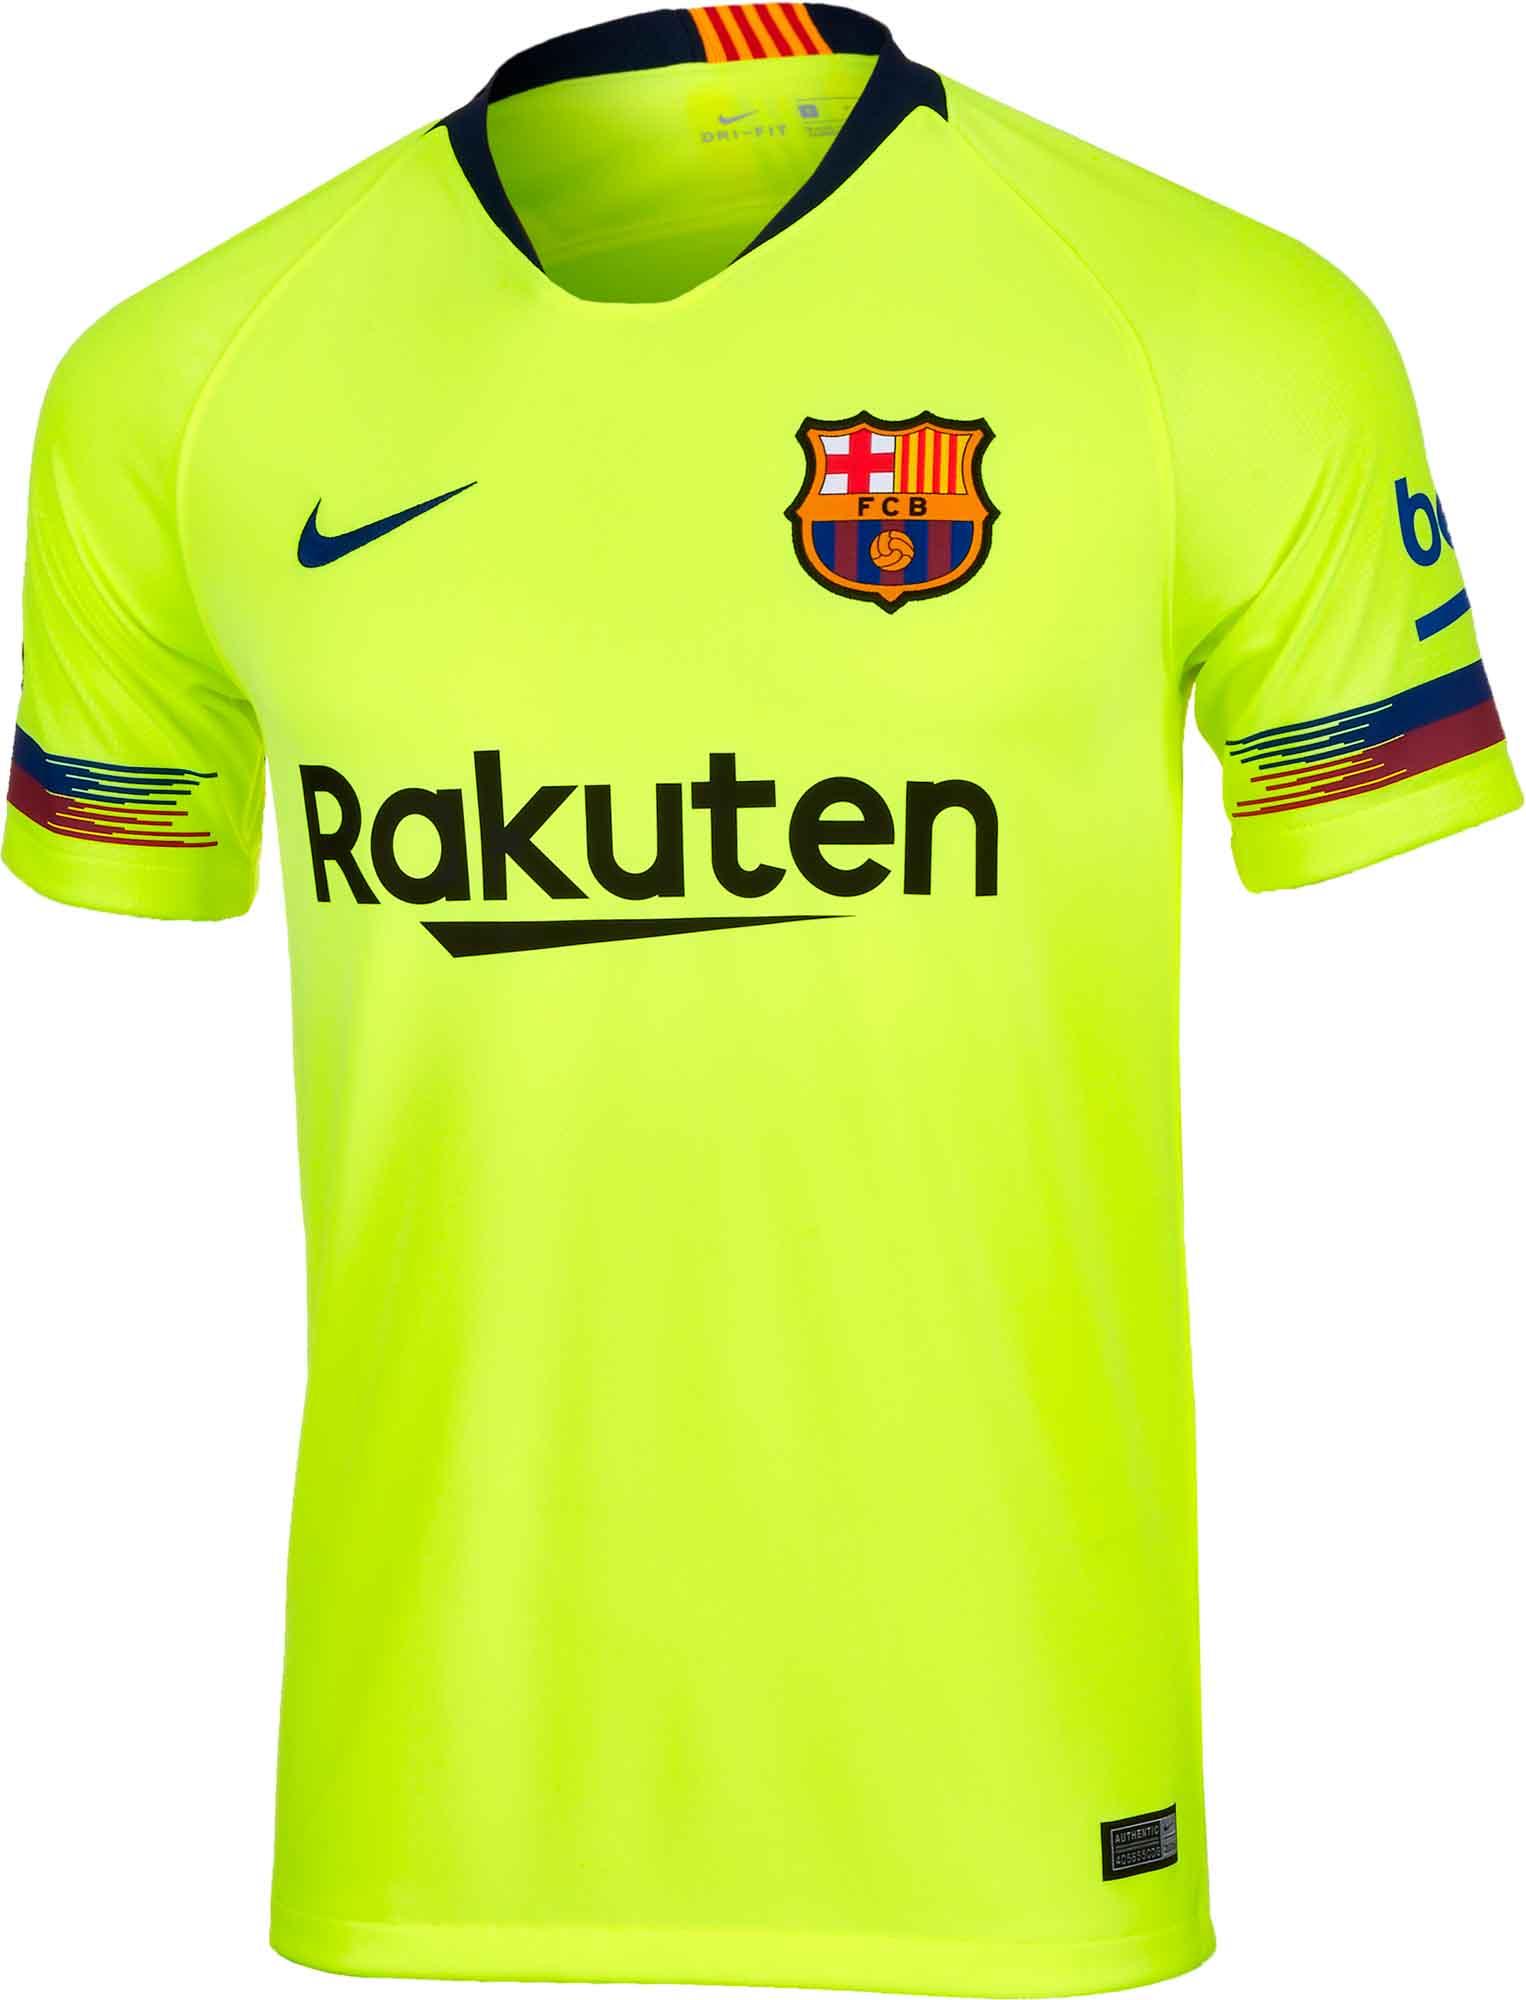 Nike Away Barcelona Away Nike Jersey 2018 19 Soccerpro d5e5e6